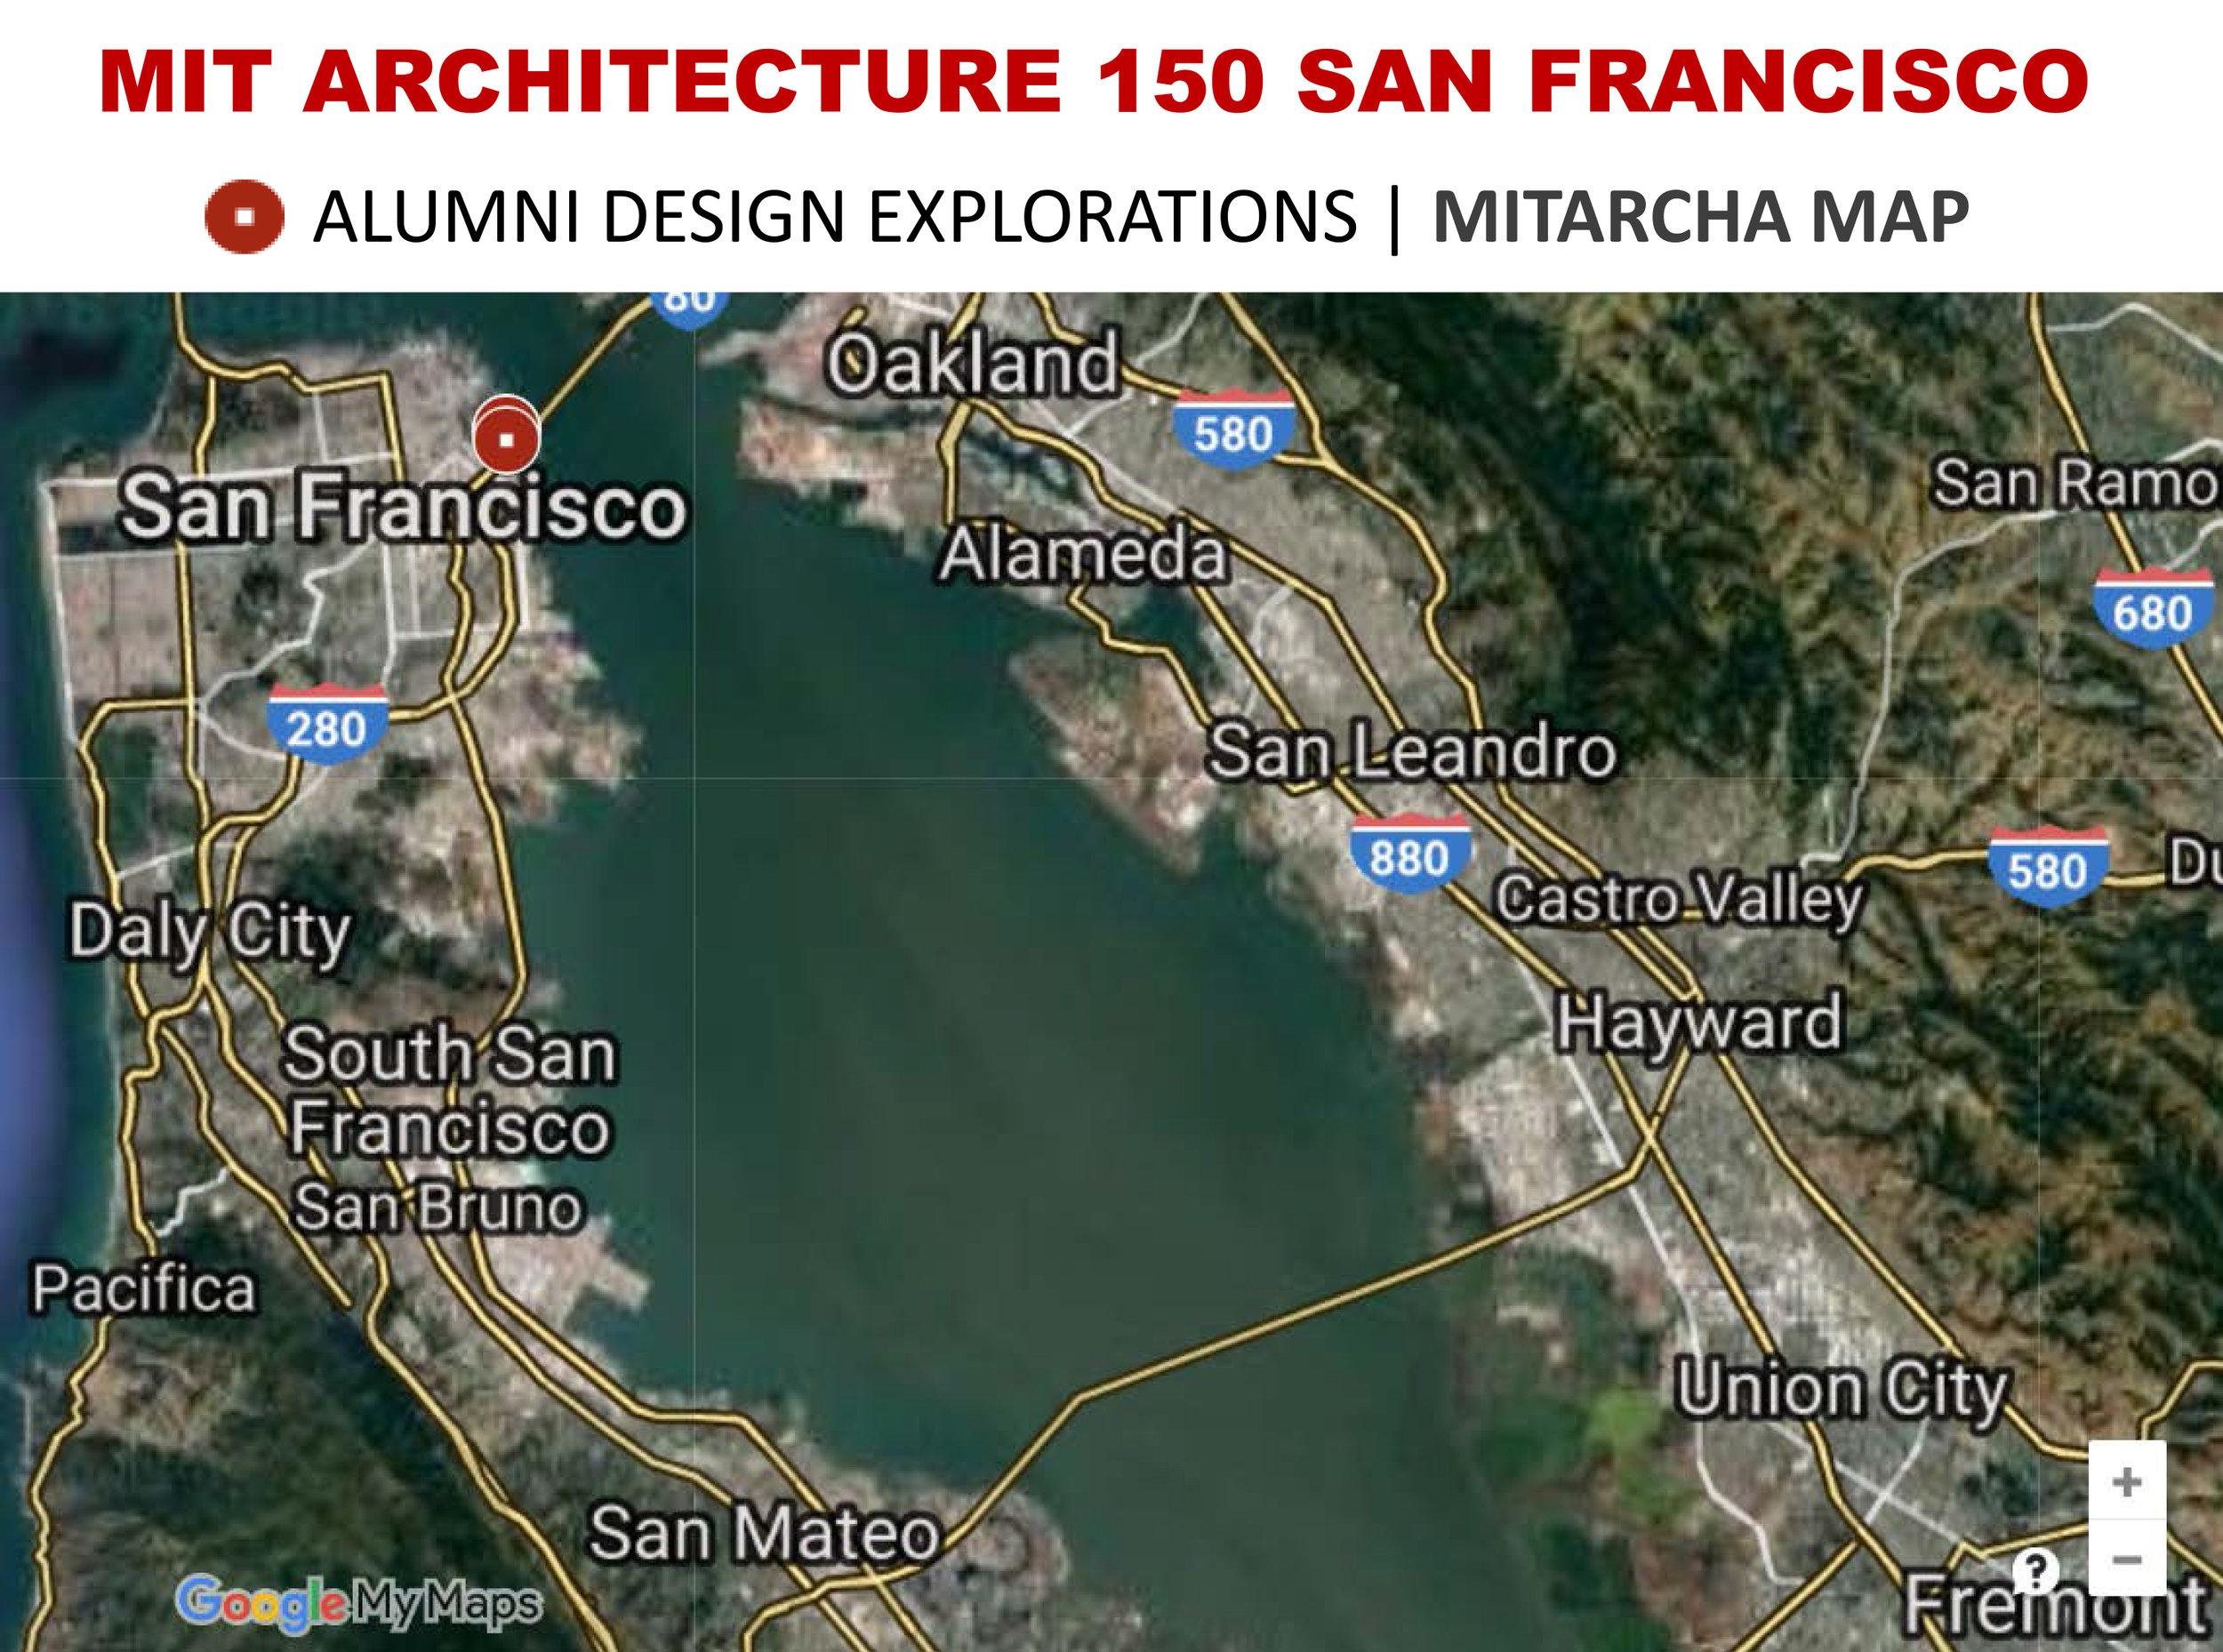 MIT ARCHITECTURE 150 SAN FRANCISCO SLIDESHOW-124 copy.jpg